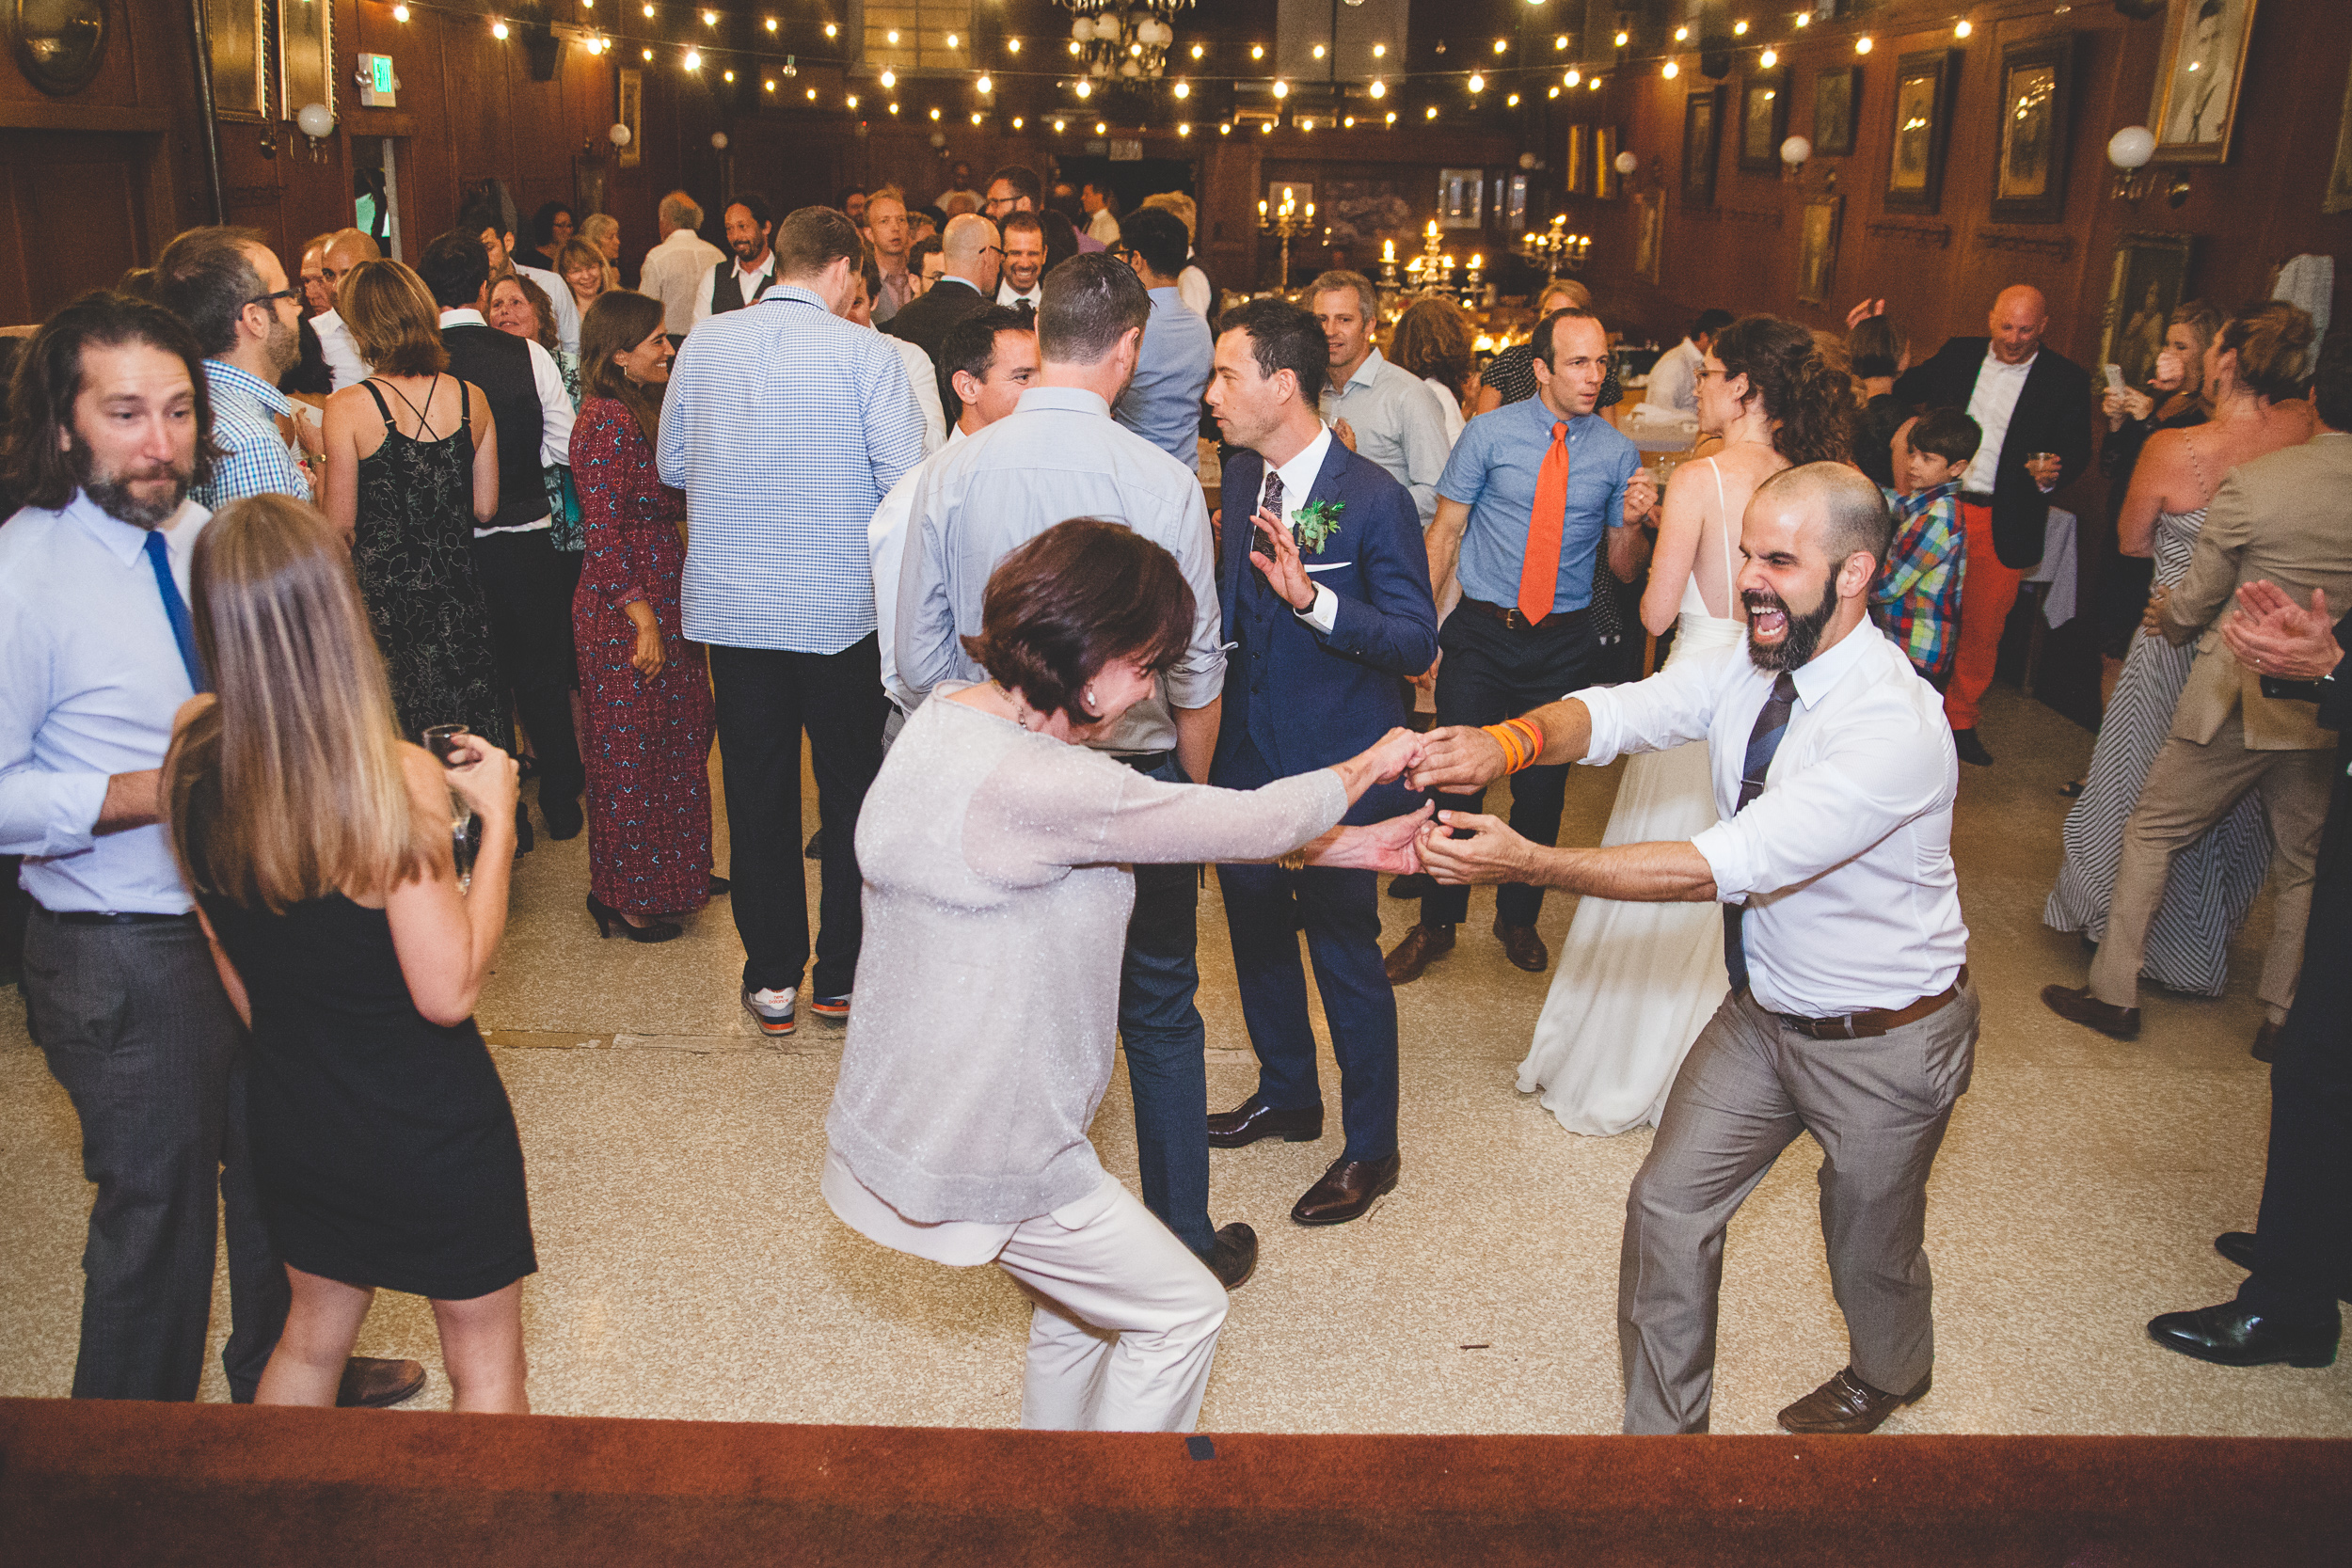 bocce ballroom wedding reception